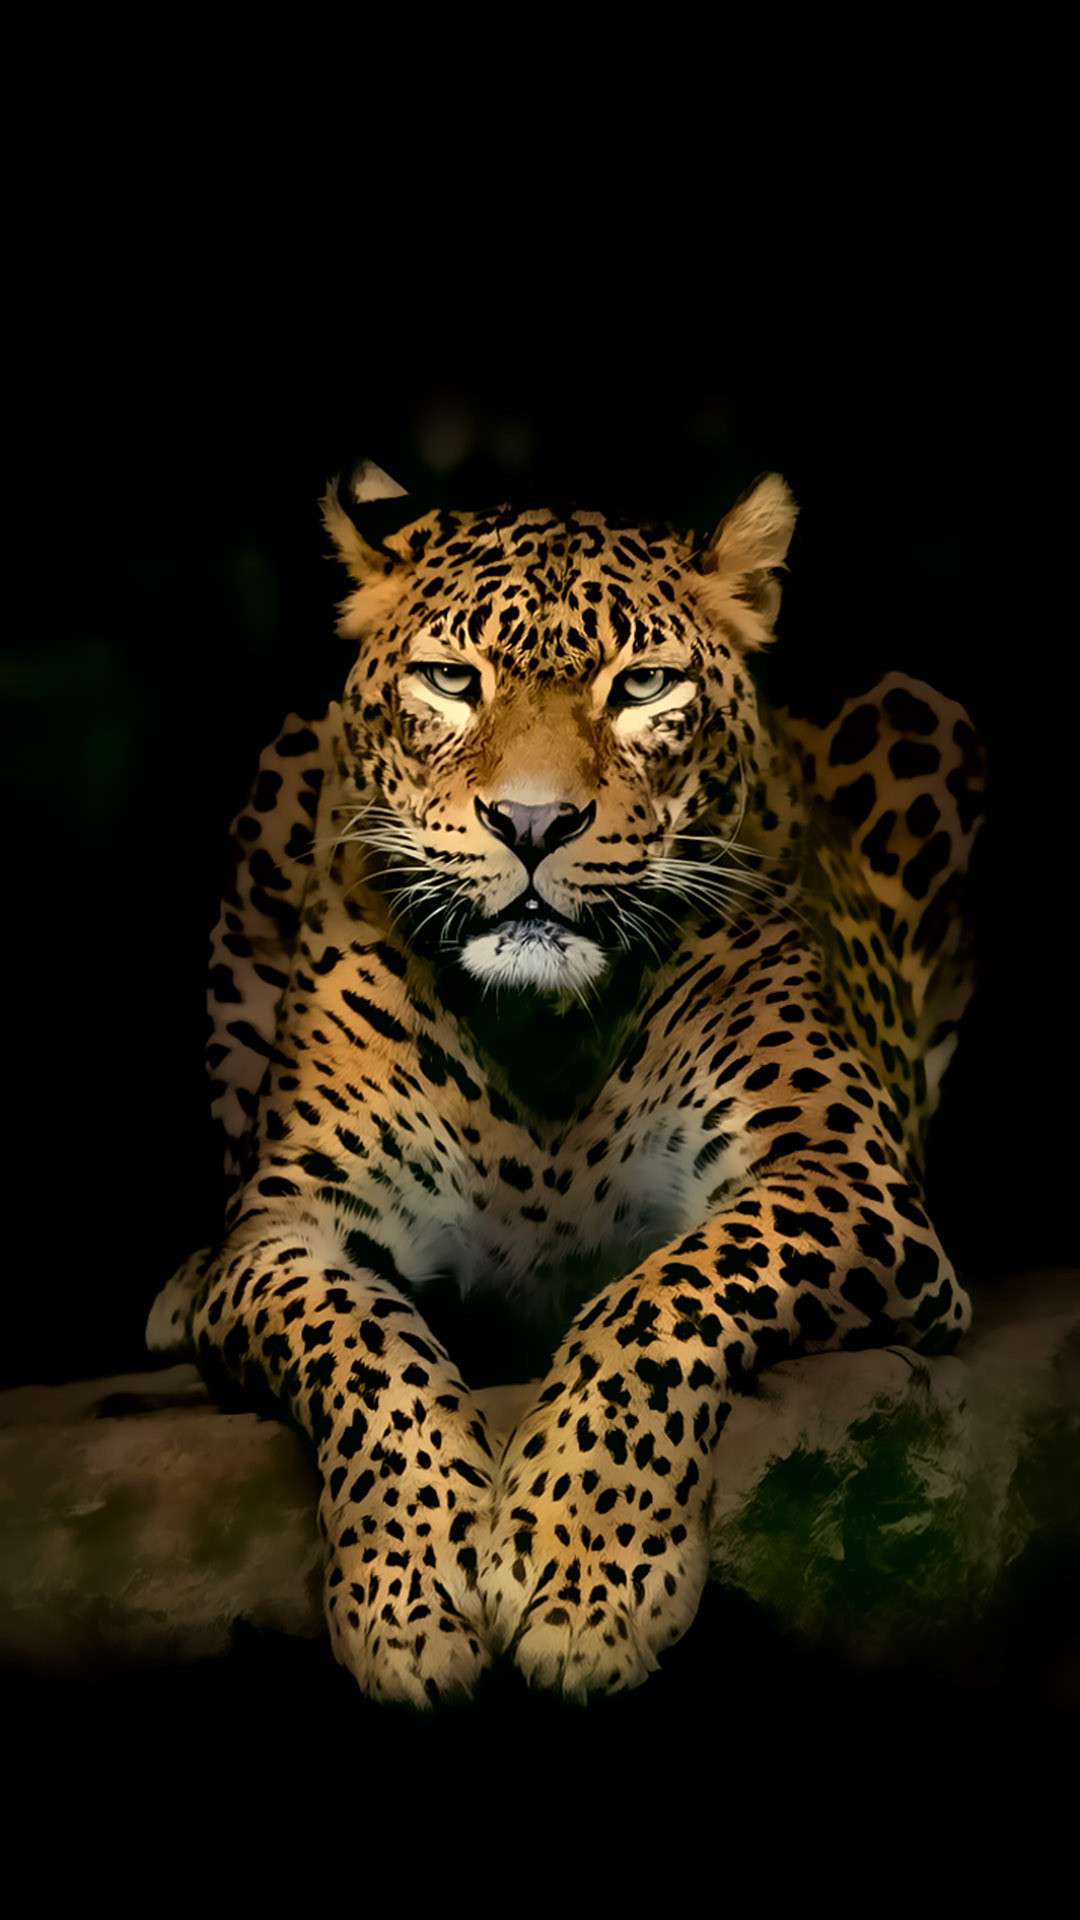 Leopard iPhone 4k ultra HD Wallpapers | HD Wallpapers